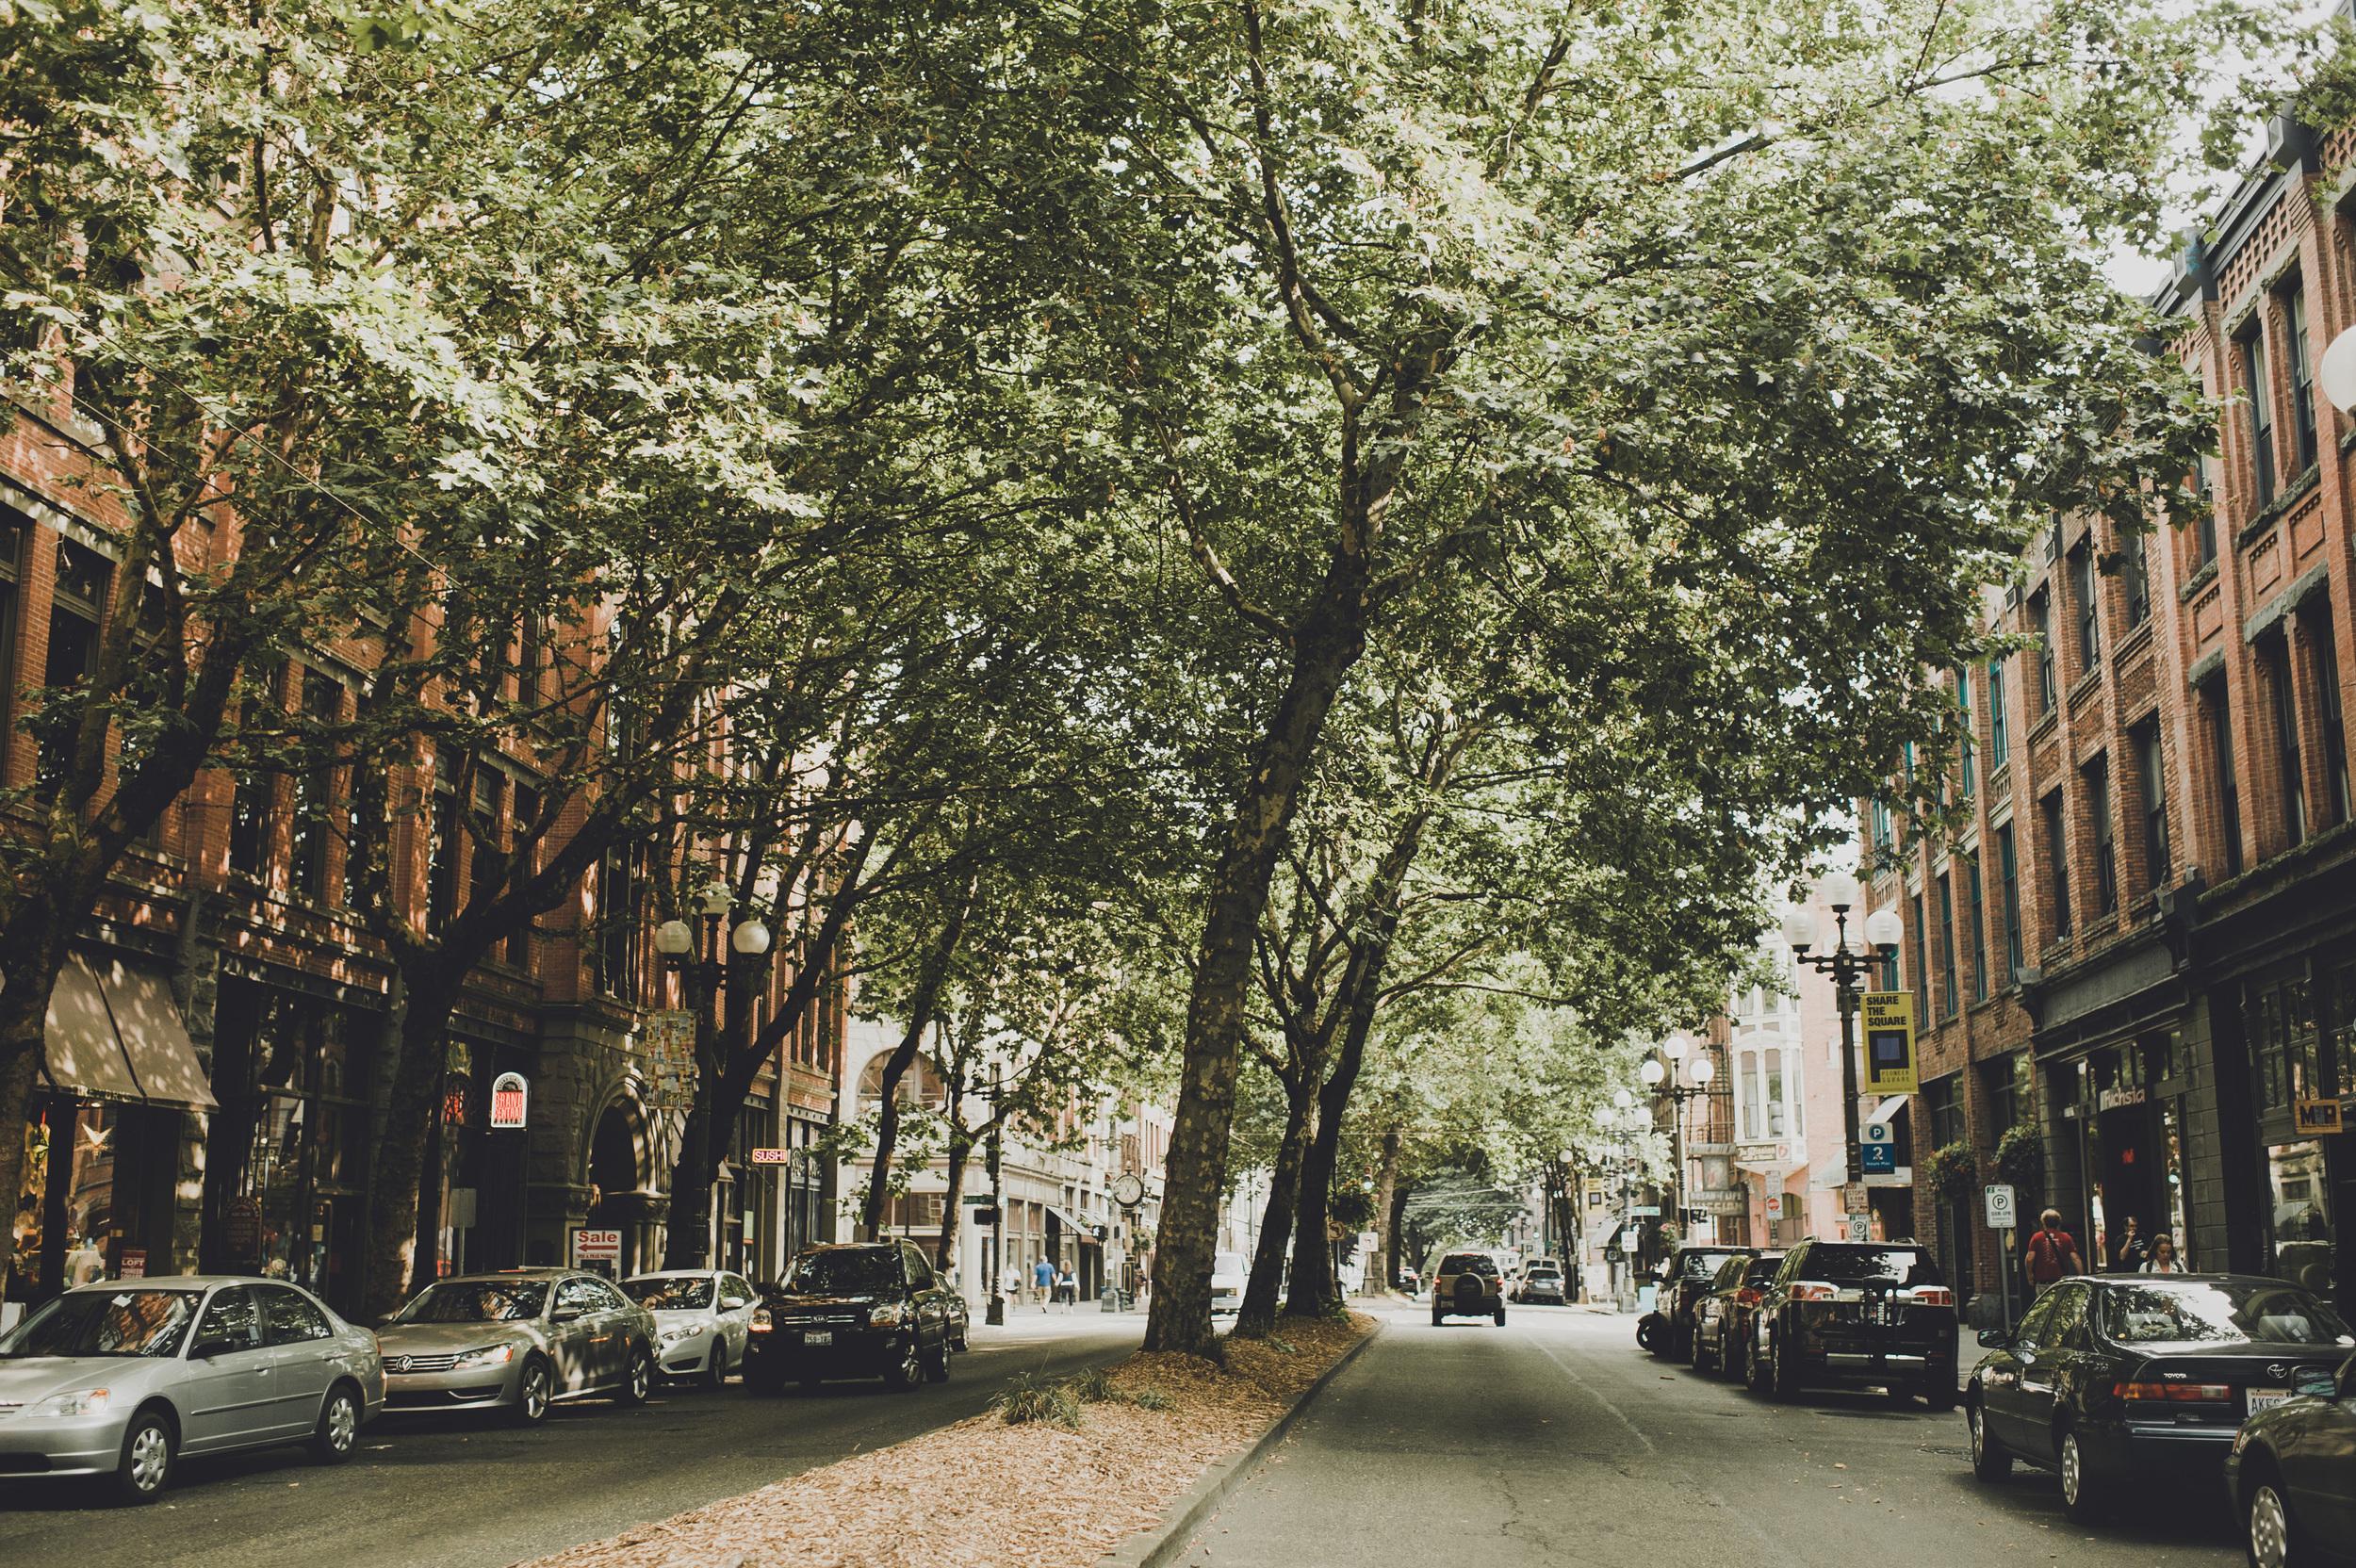 CASPhoto_ThePioneerCollective_Neighborhood-3.JPG